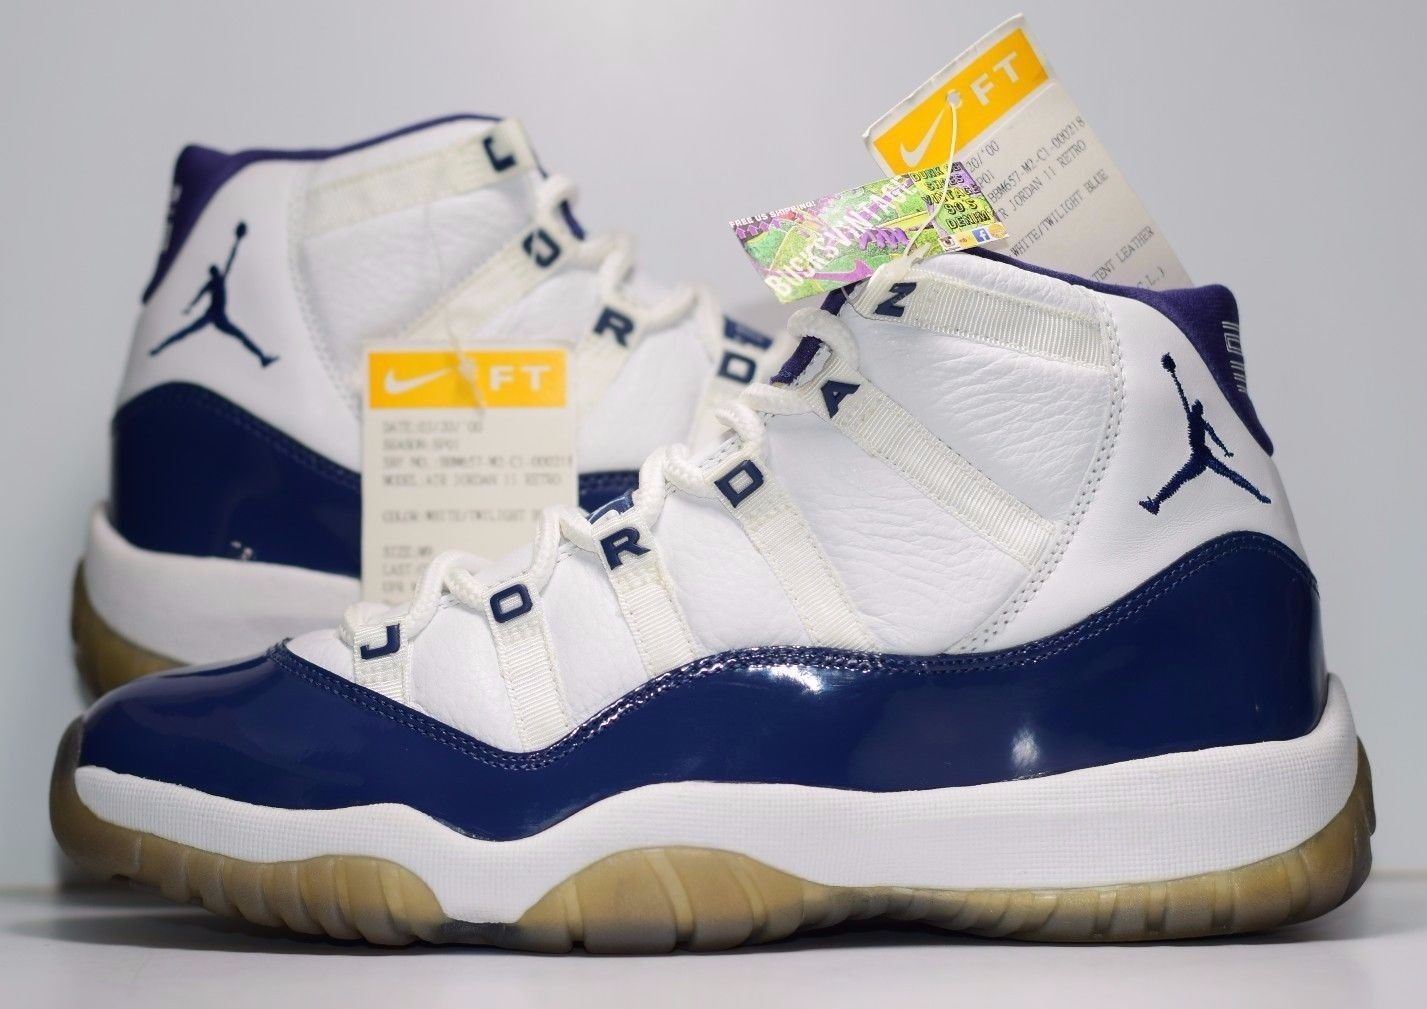 online store 76c9d b51d2 Size 9   2000 Nike Air Jordan XI PROMO SAMPLE 1 of 1 Twilight Blue Gum